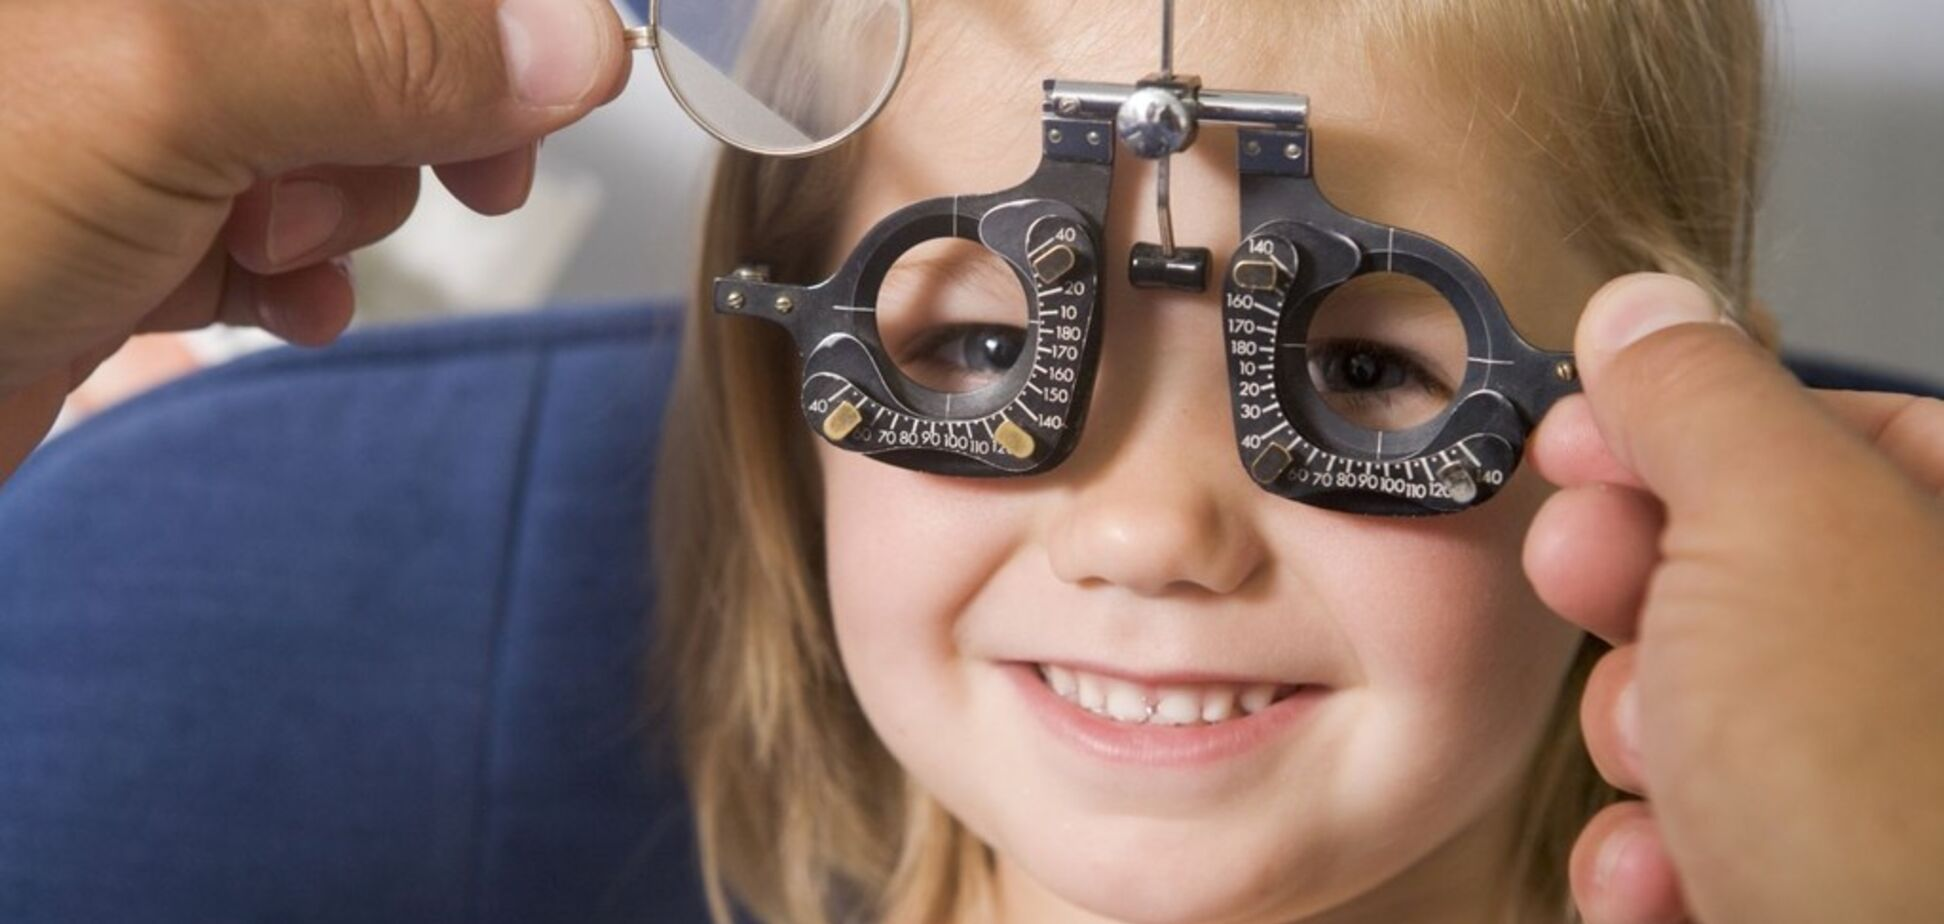 Астигматизм: коррекция нечеткого зрения